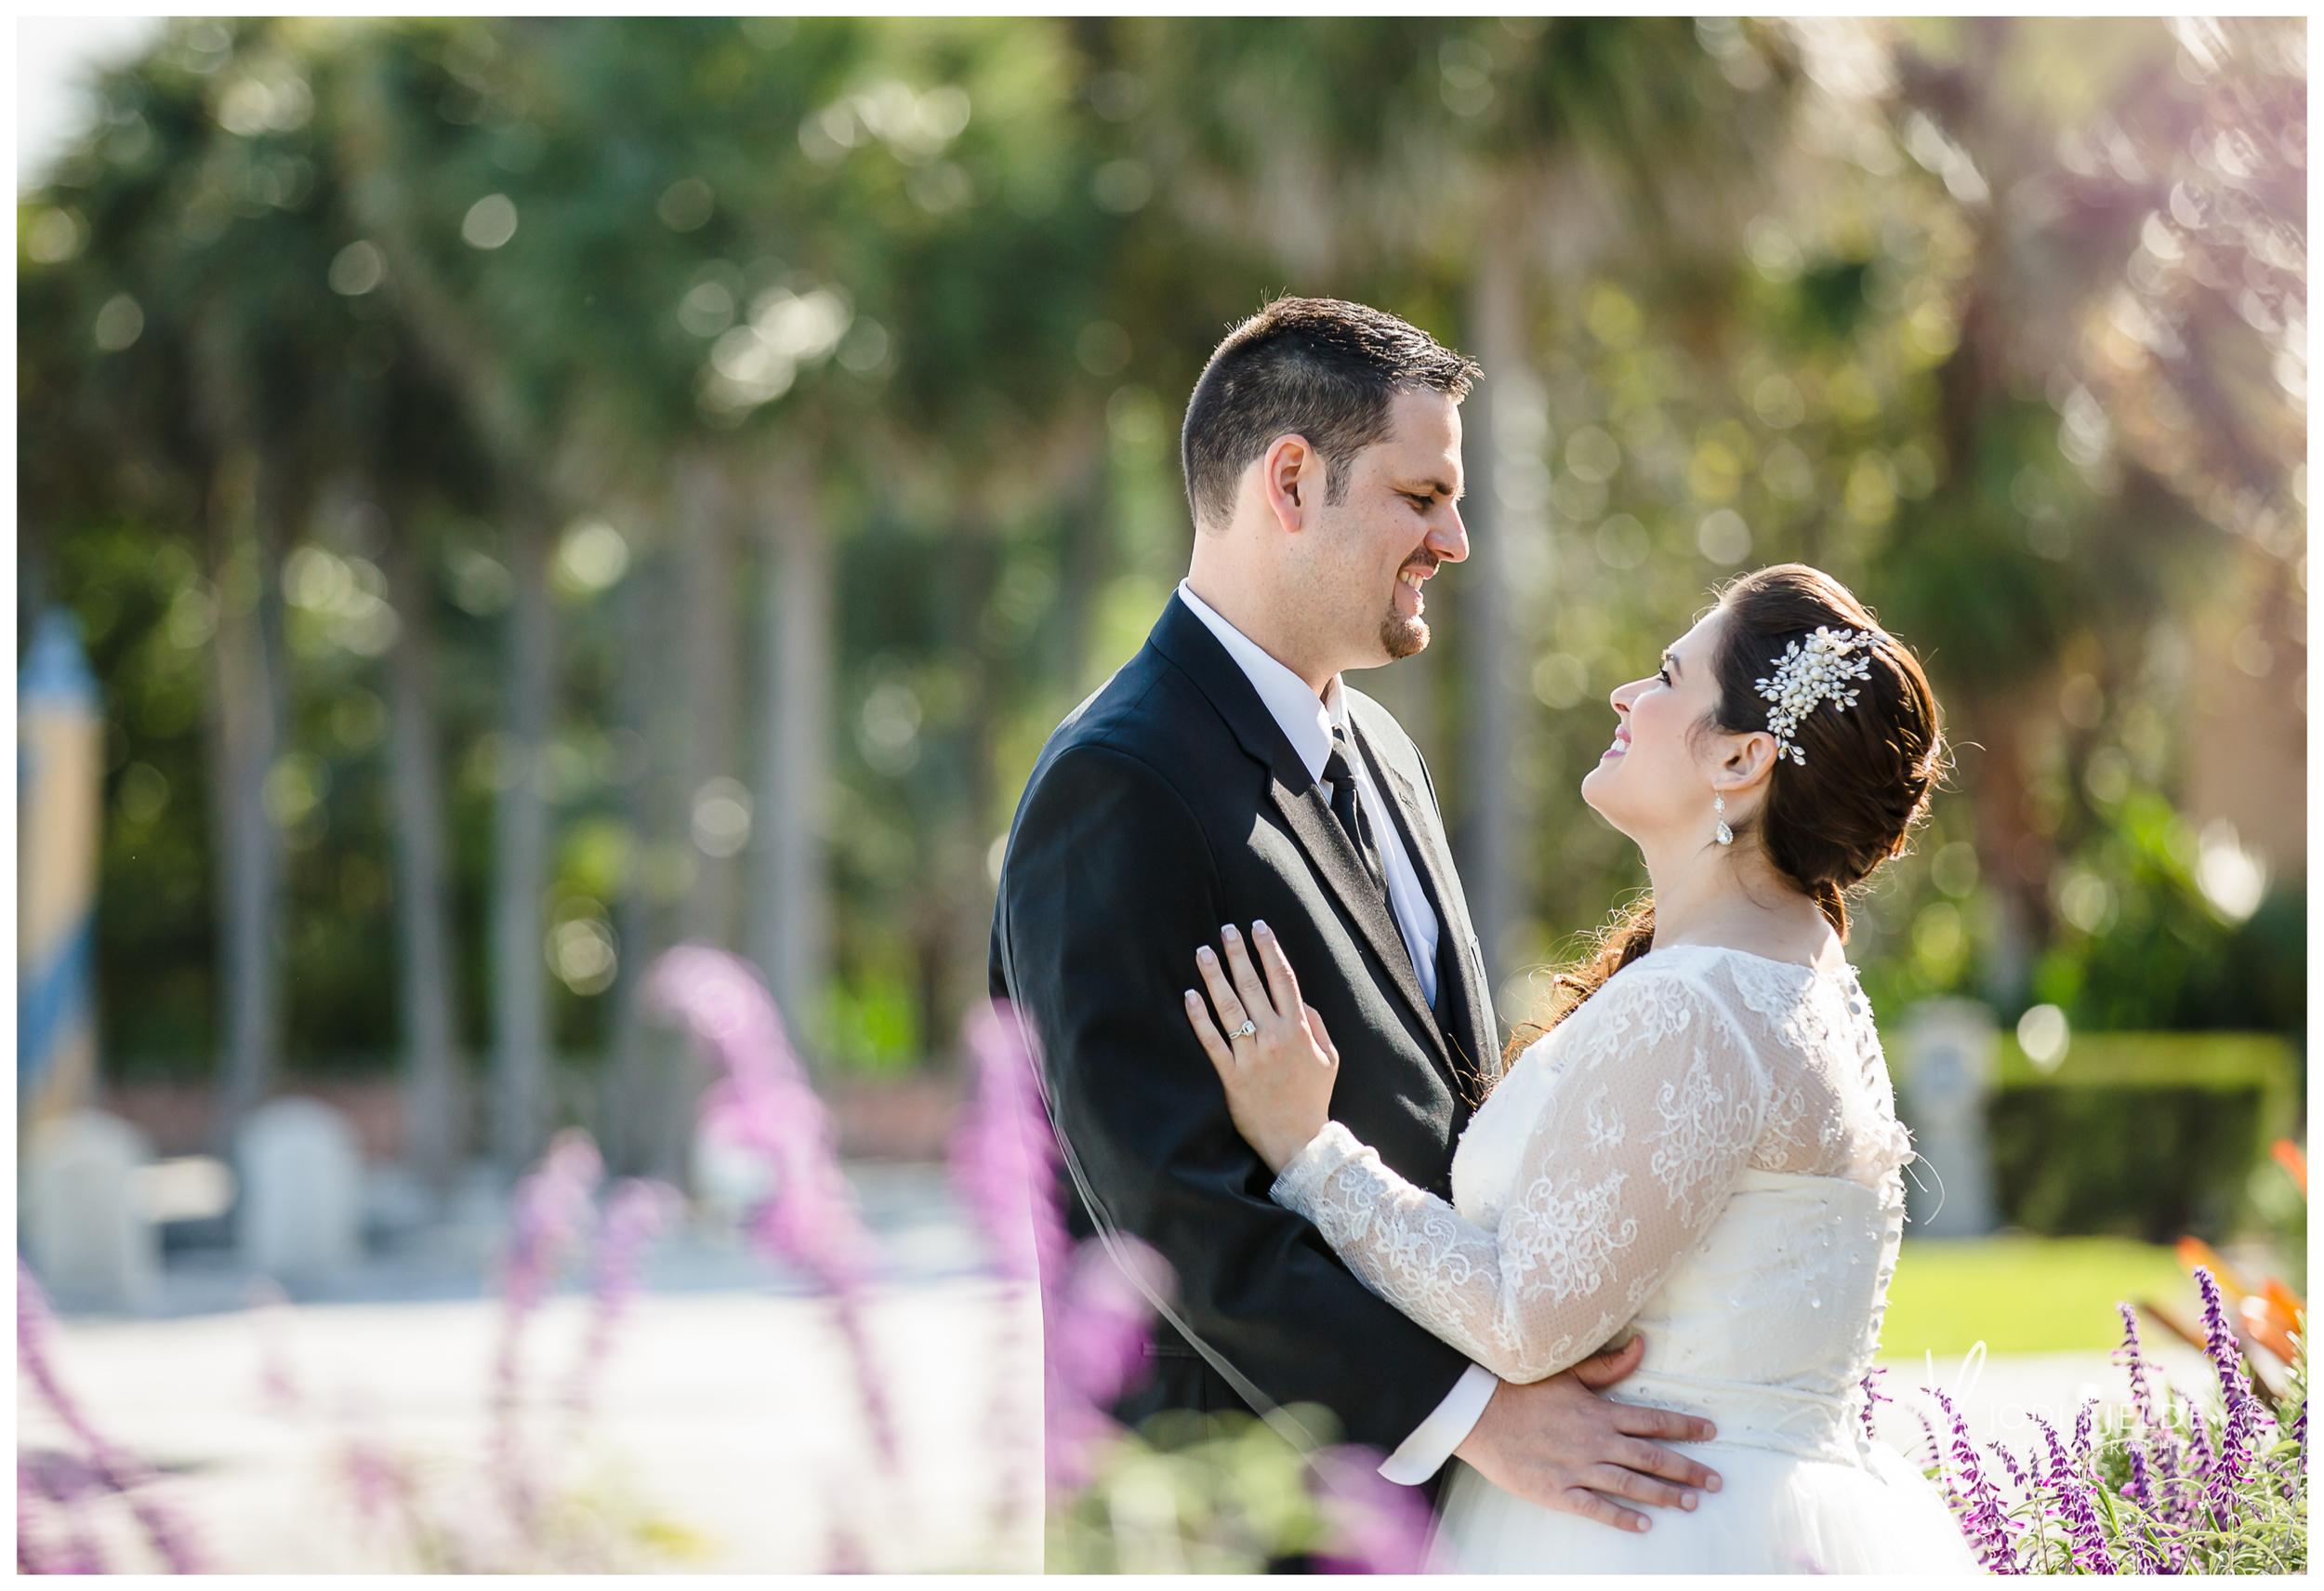 Ballroom Wedding_Ft Lauderdale_Florida_wedding_Maria_&_Juan_photography_jodi_Fjelde_photography-16.jpg